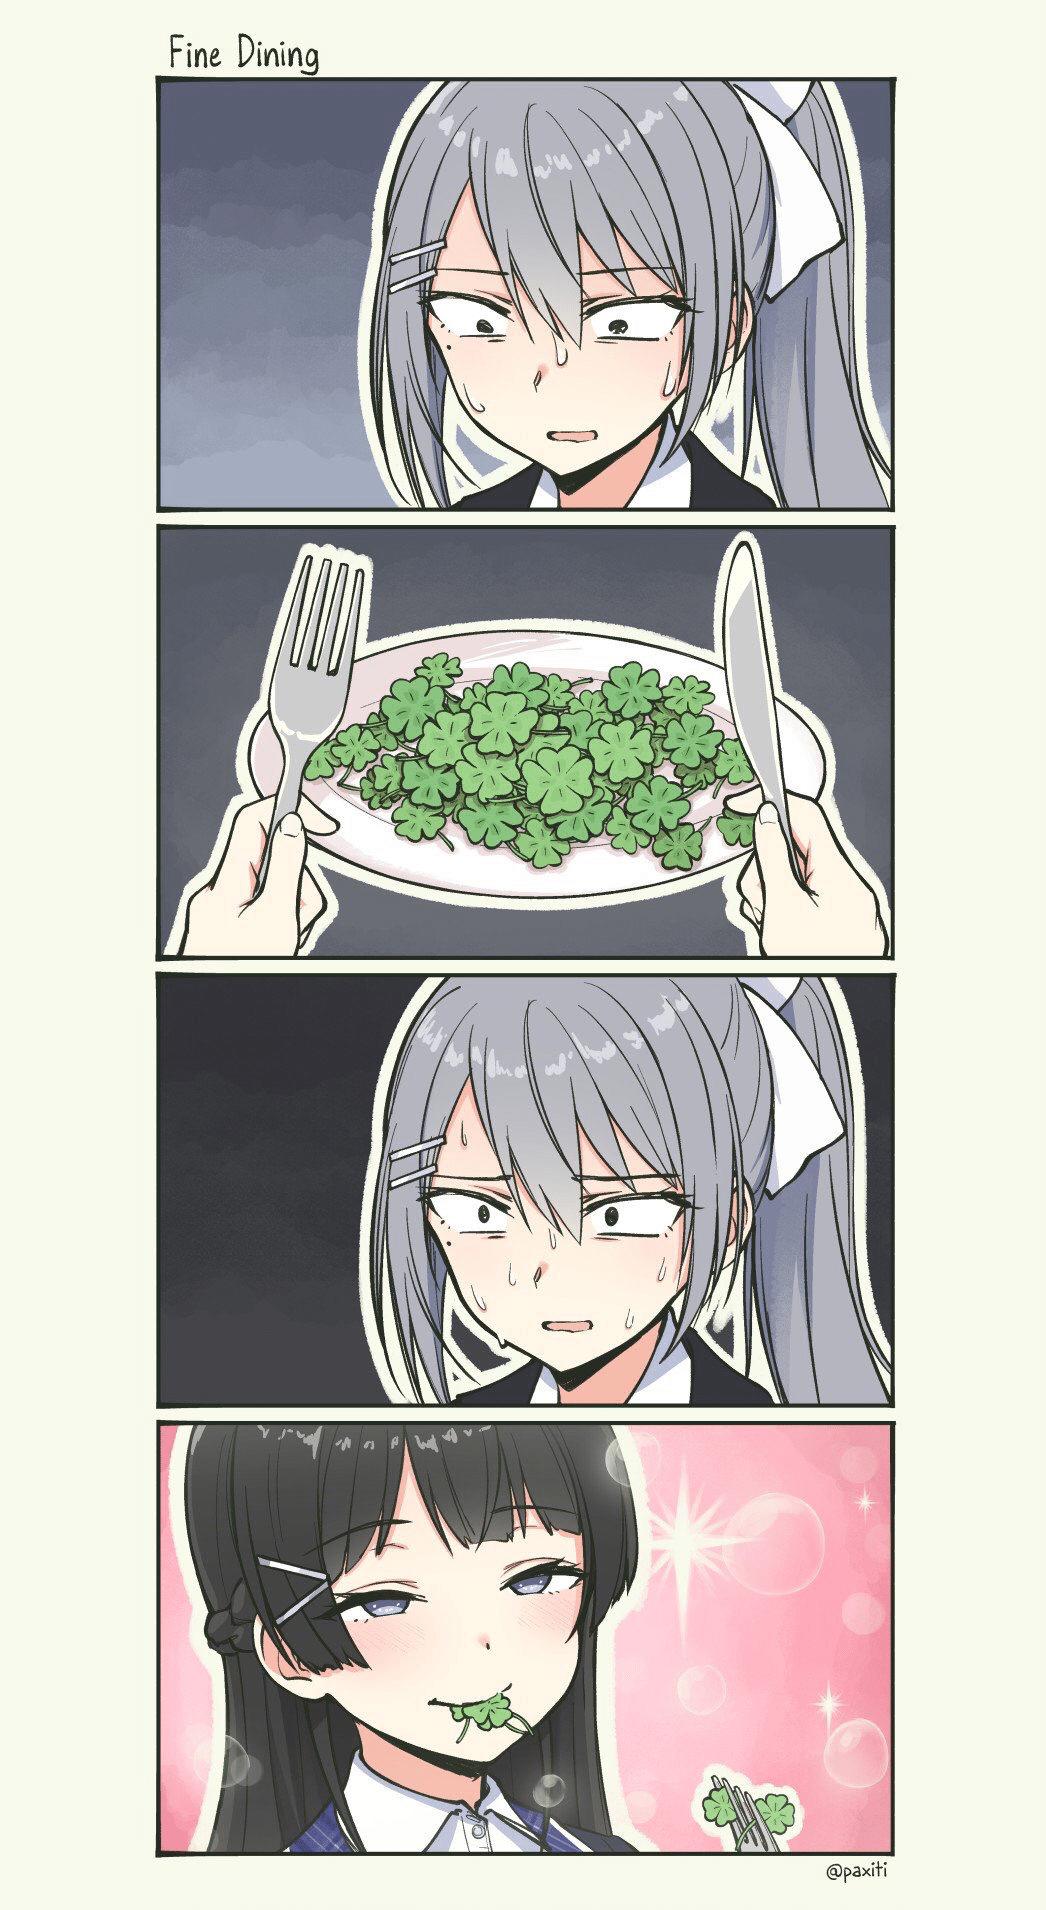 Meme Generator - Eating clovers (blank template) - Newfa Stuff